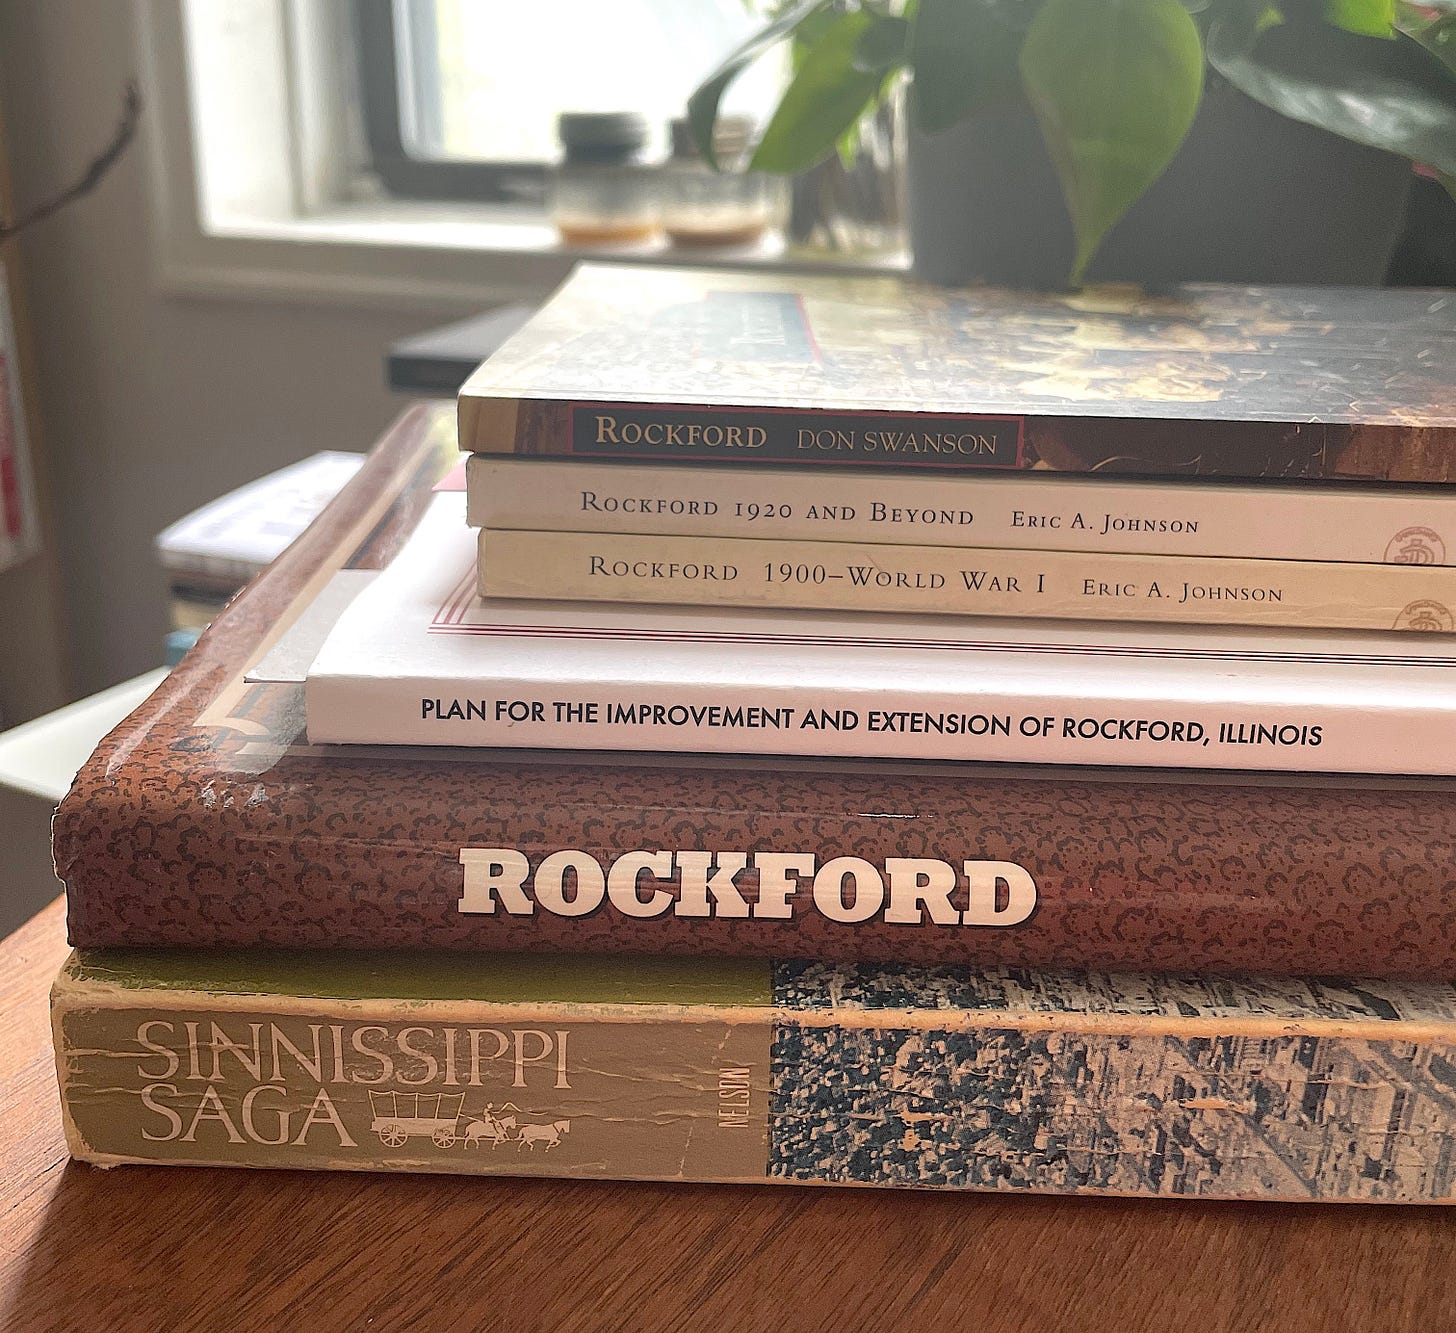 Rockford books